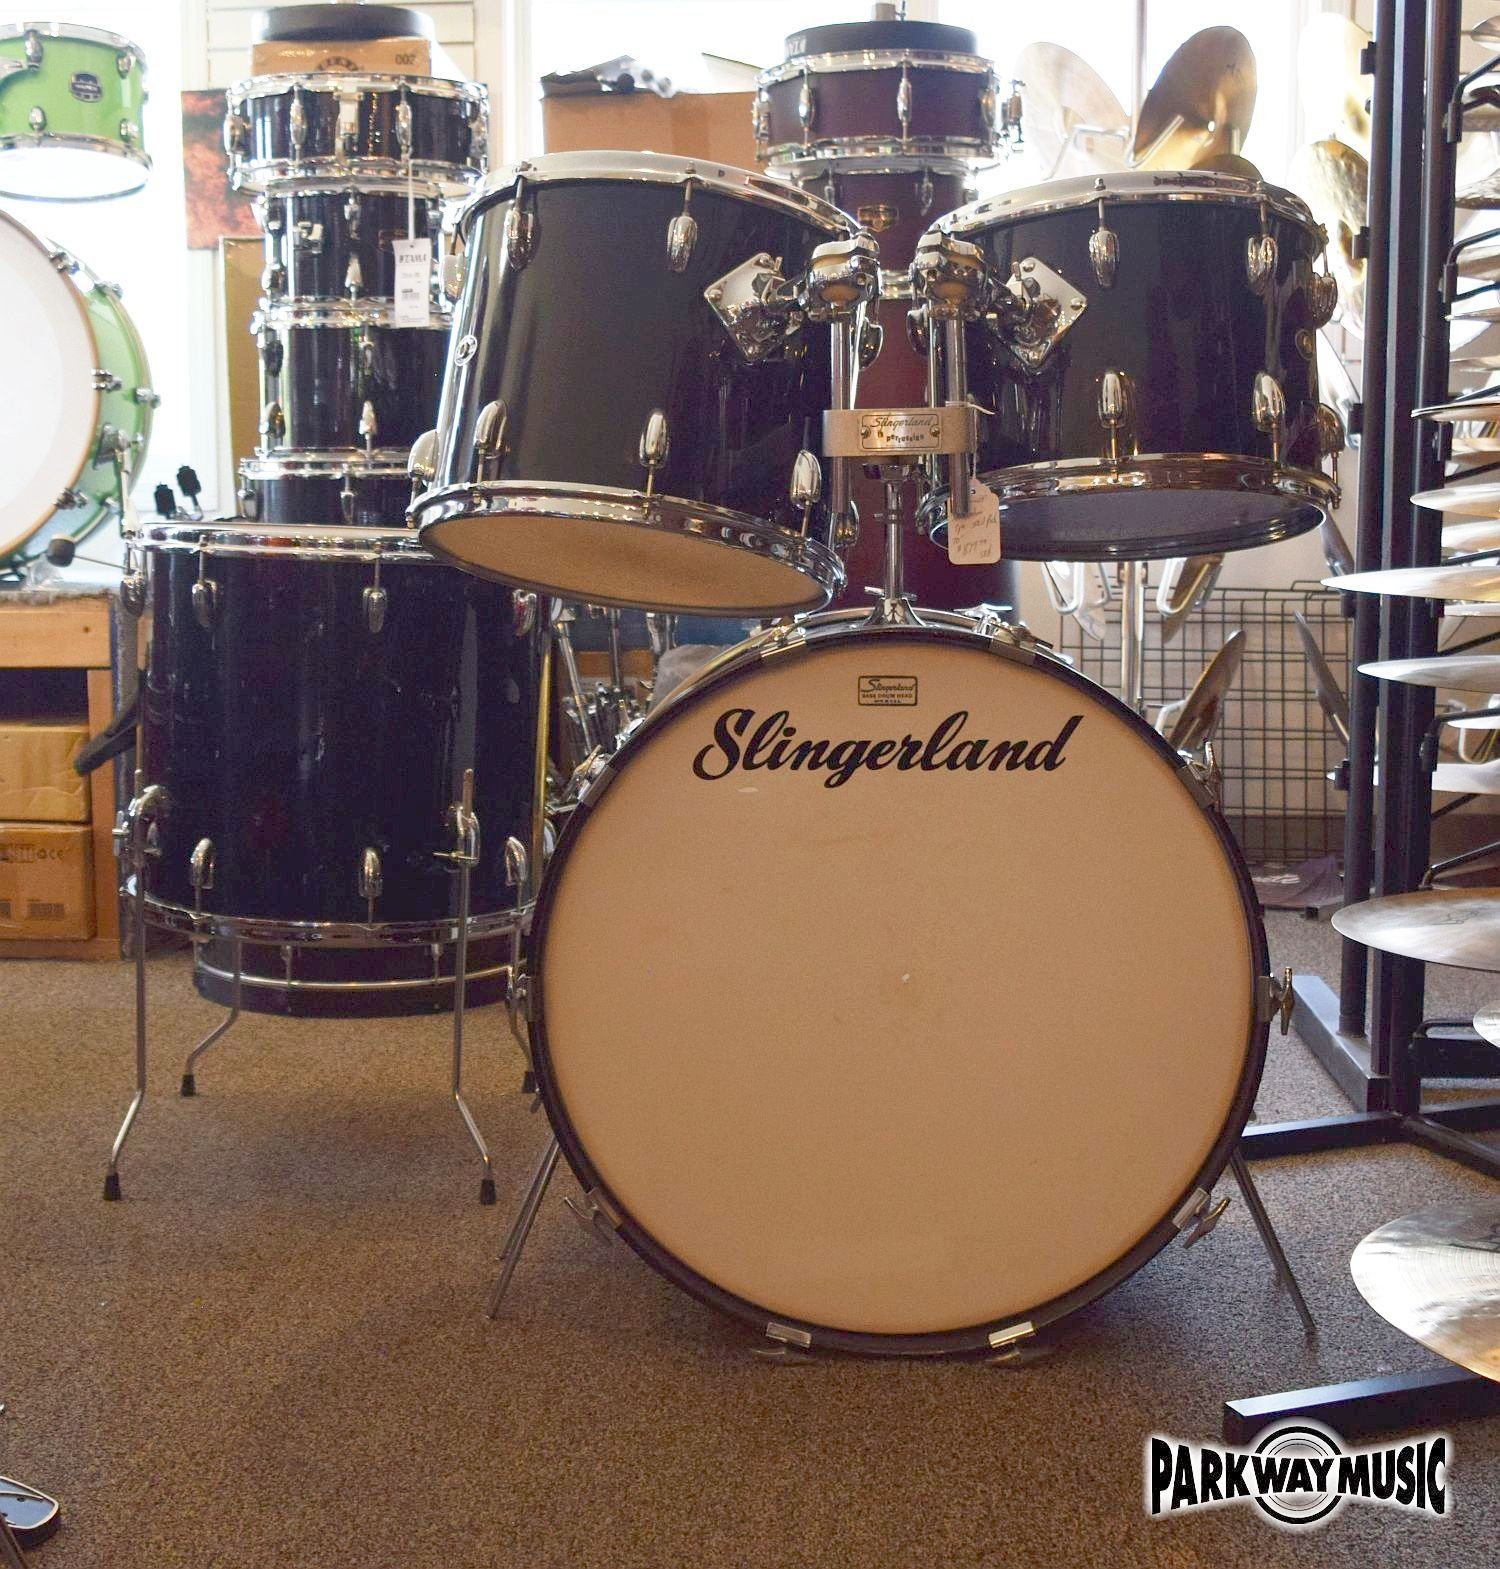 Slingerland Vintage 1970 Drum Set 4 pc Shell Pack (USED)